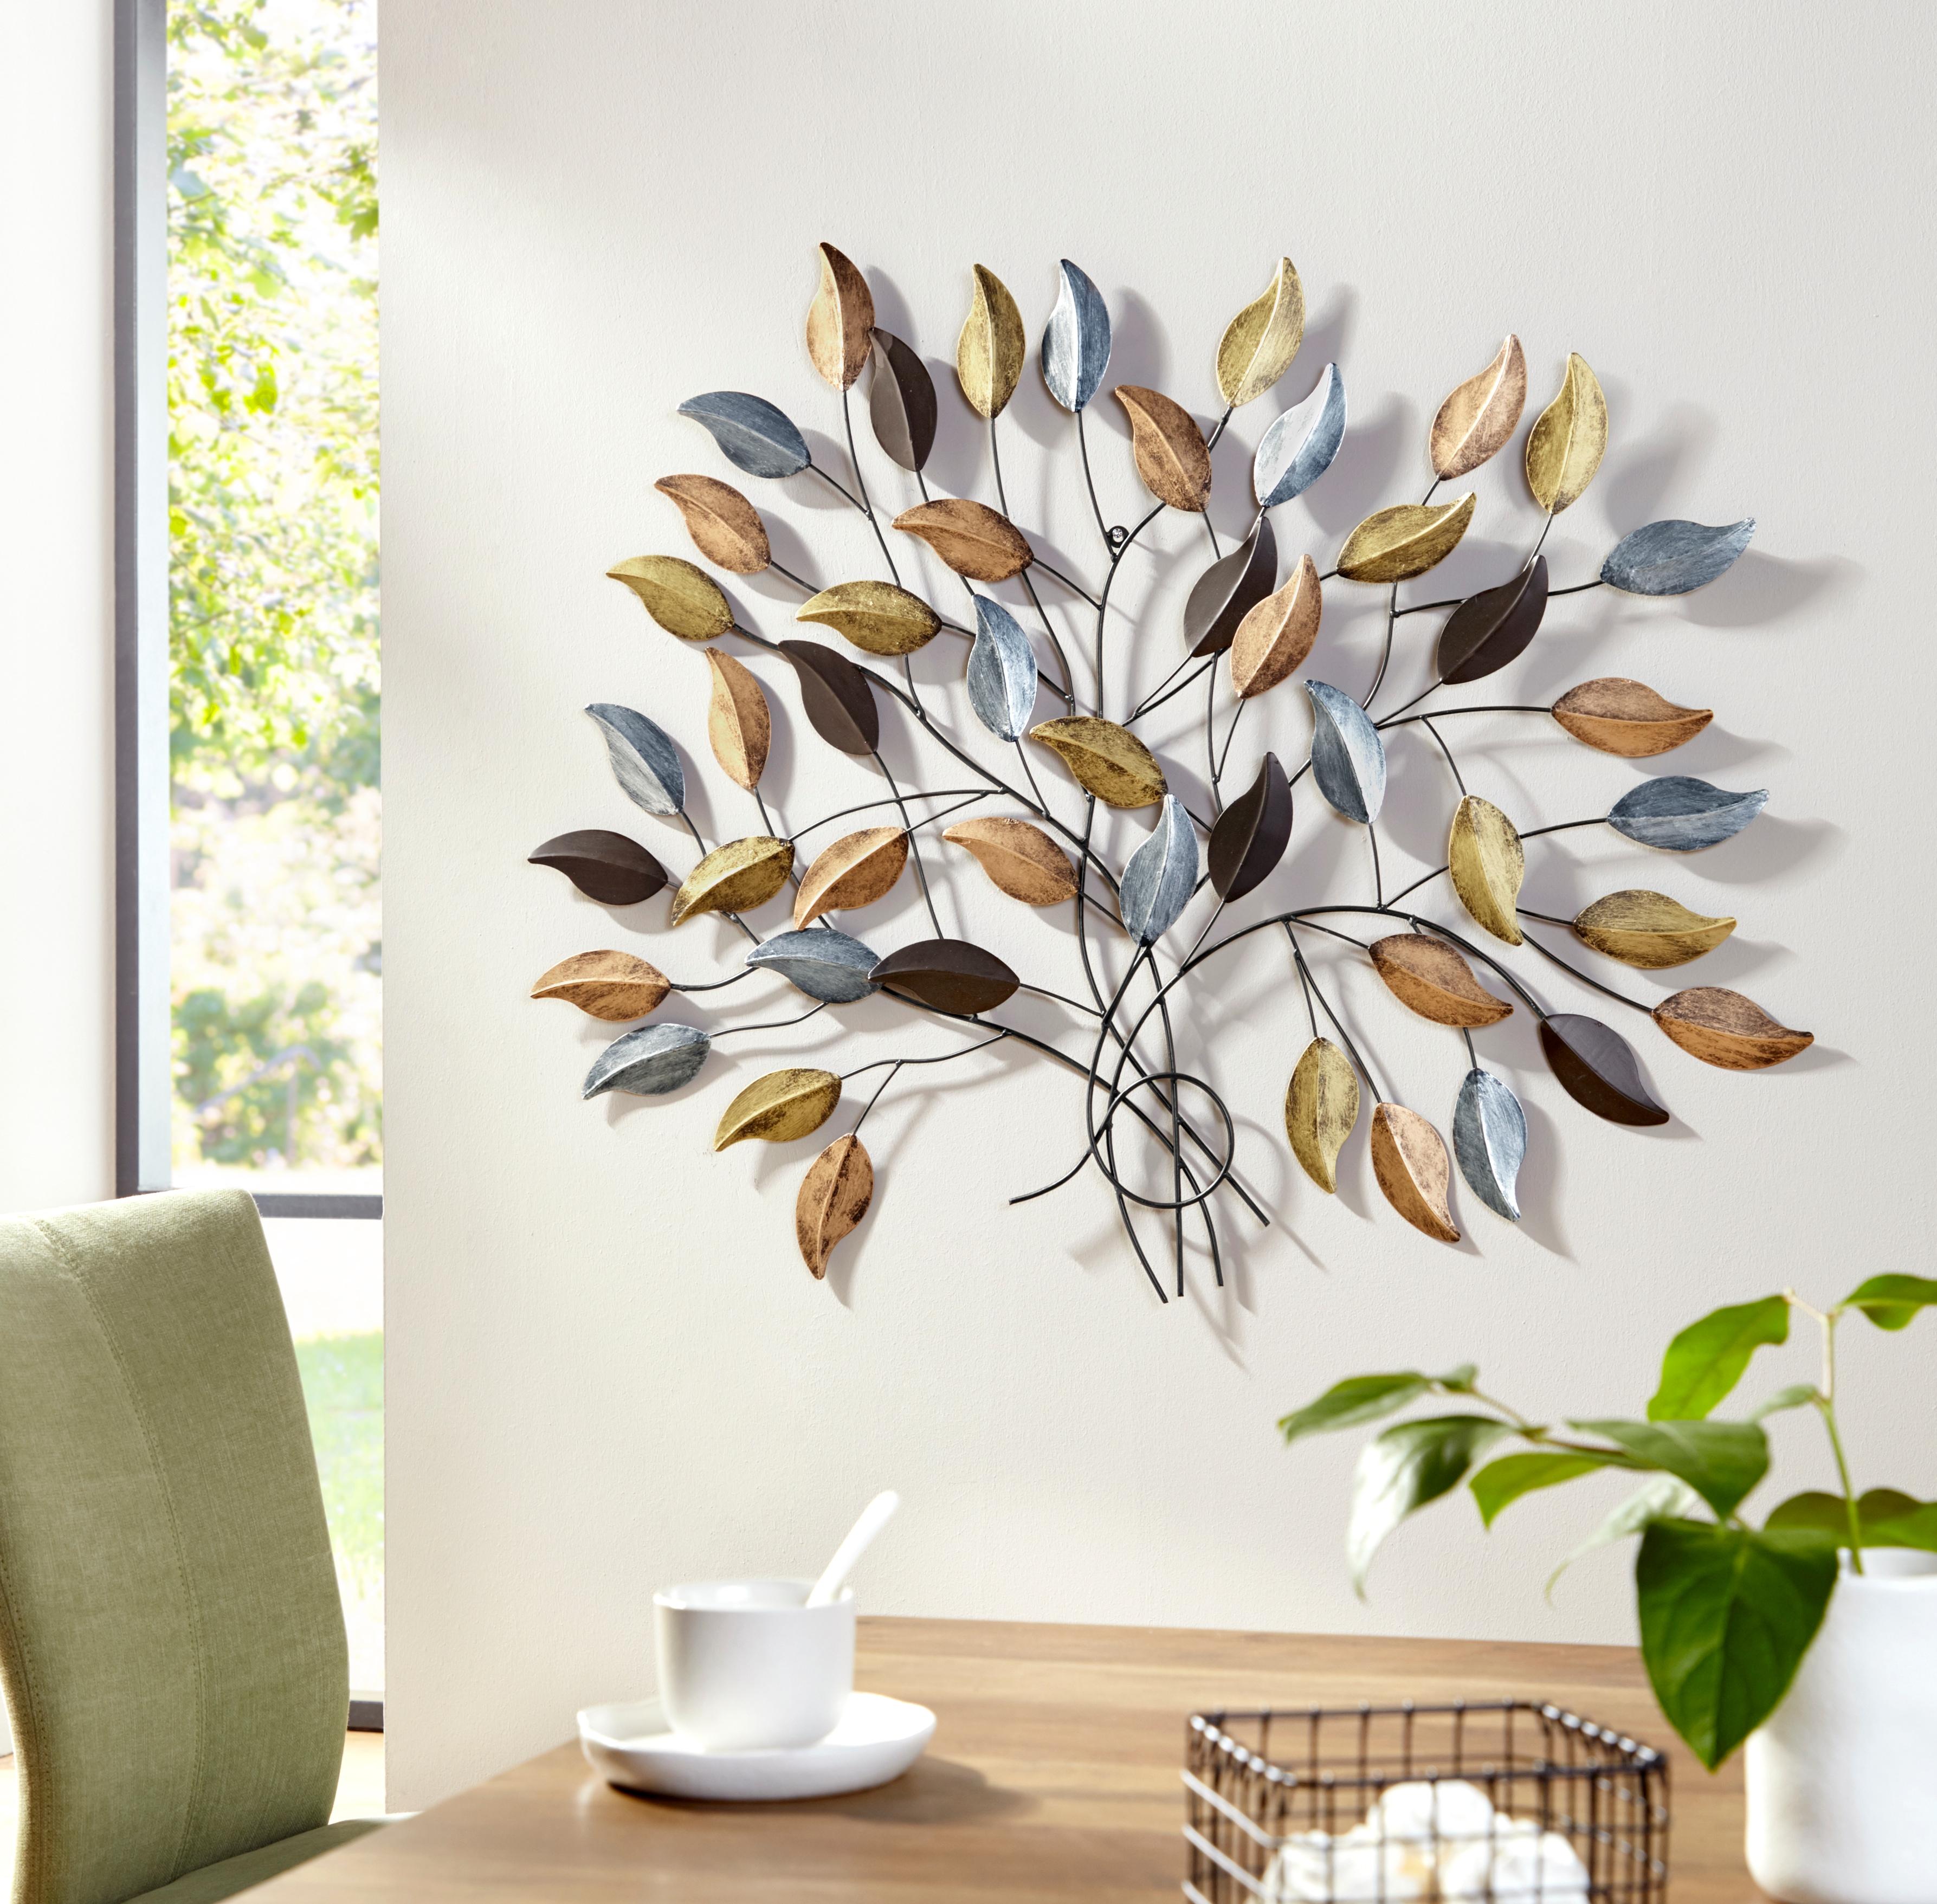 my home Wanddekoobjekt Fagus, Wanddeko, Wanddekoration, aus Metall bunt Wanddekoration Deko Wohnaccessoires